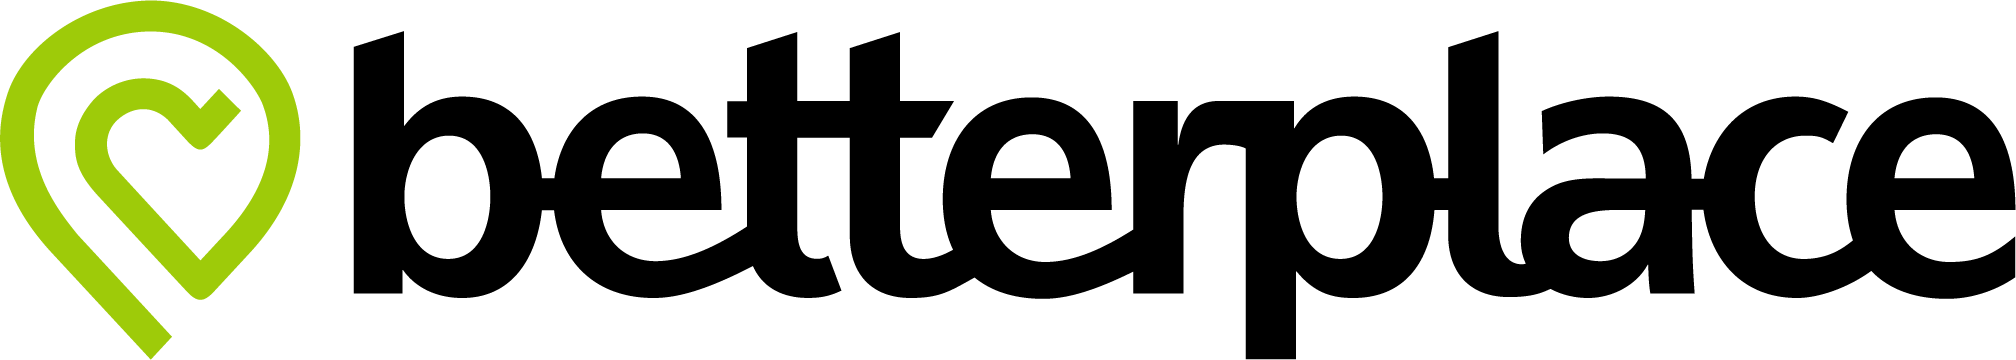 betterplace-logo